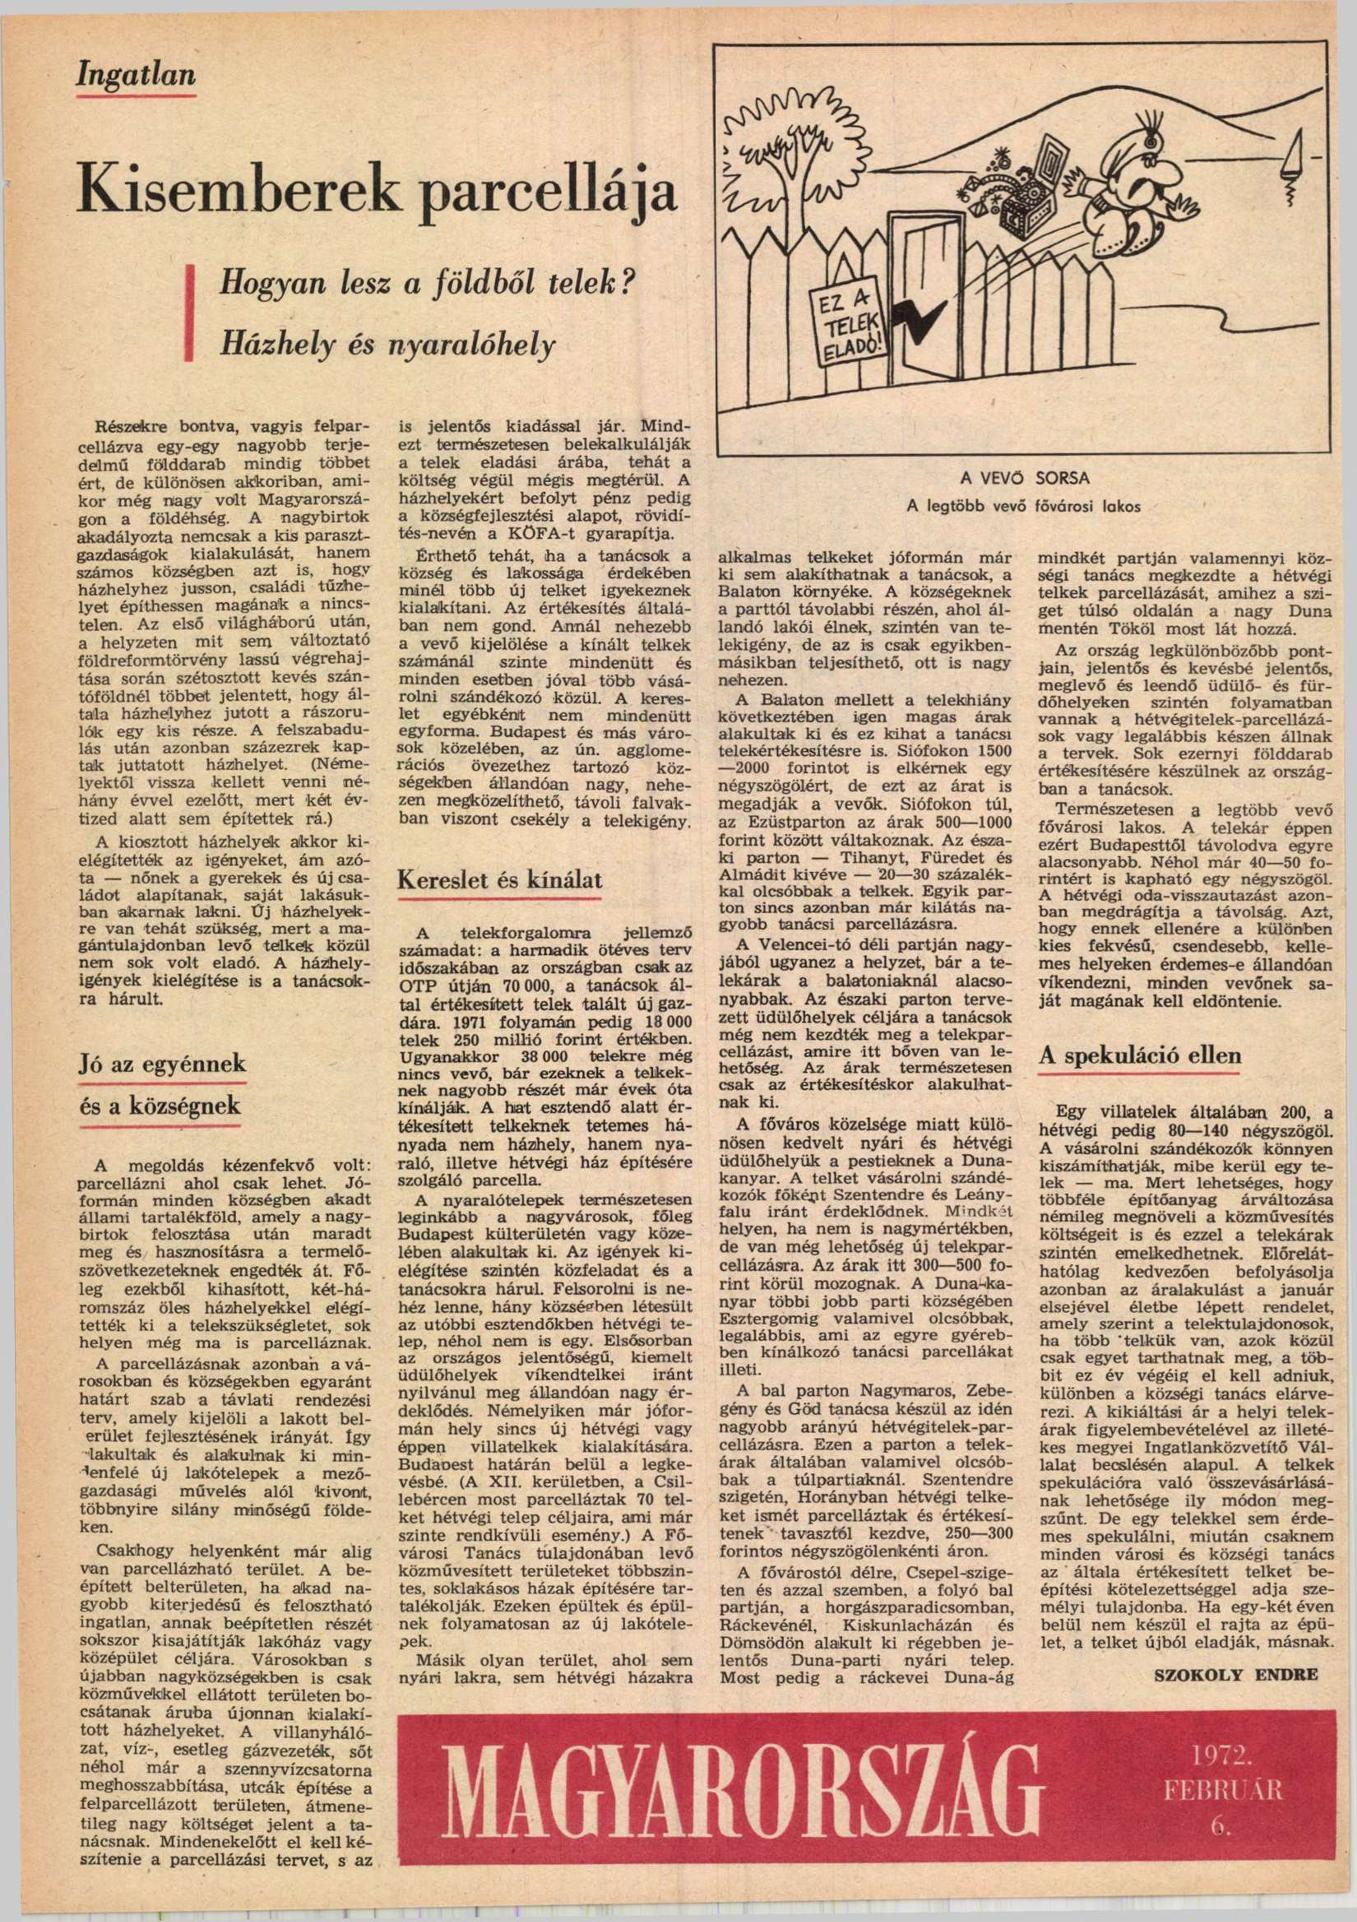 magyarorszaguj_1972_1-1541803571_pages192-192.jpg